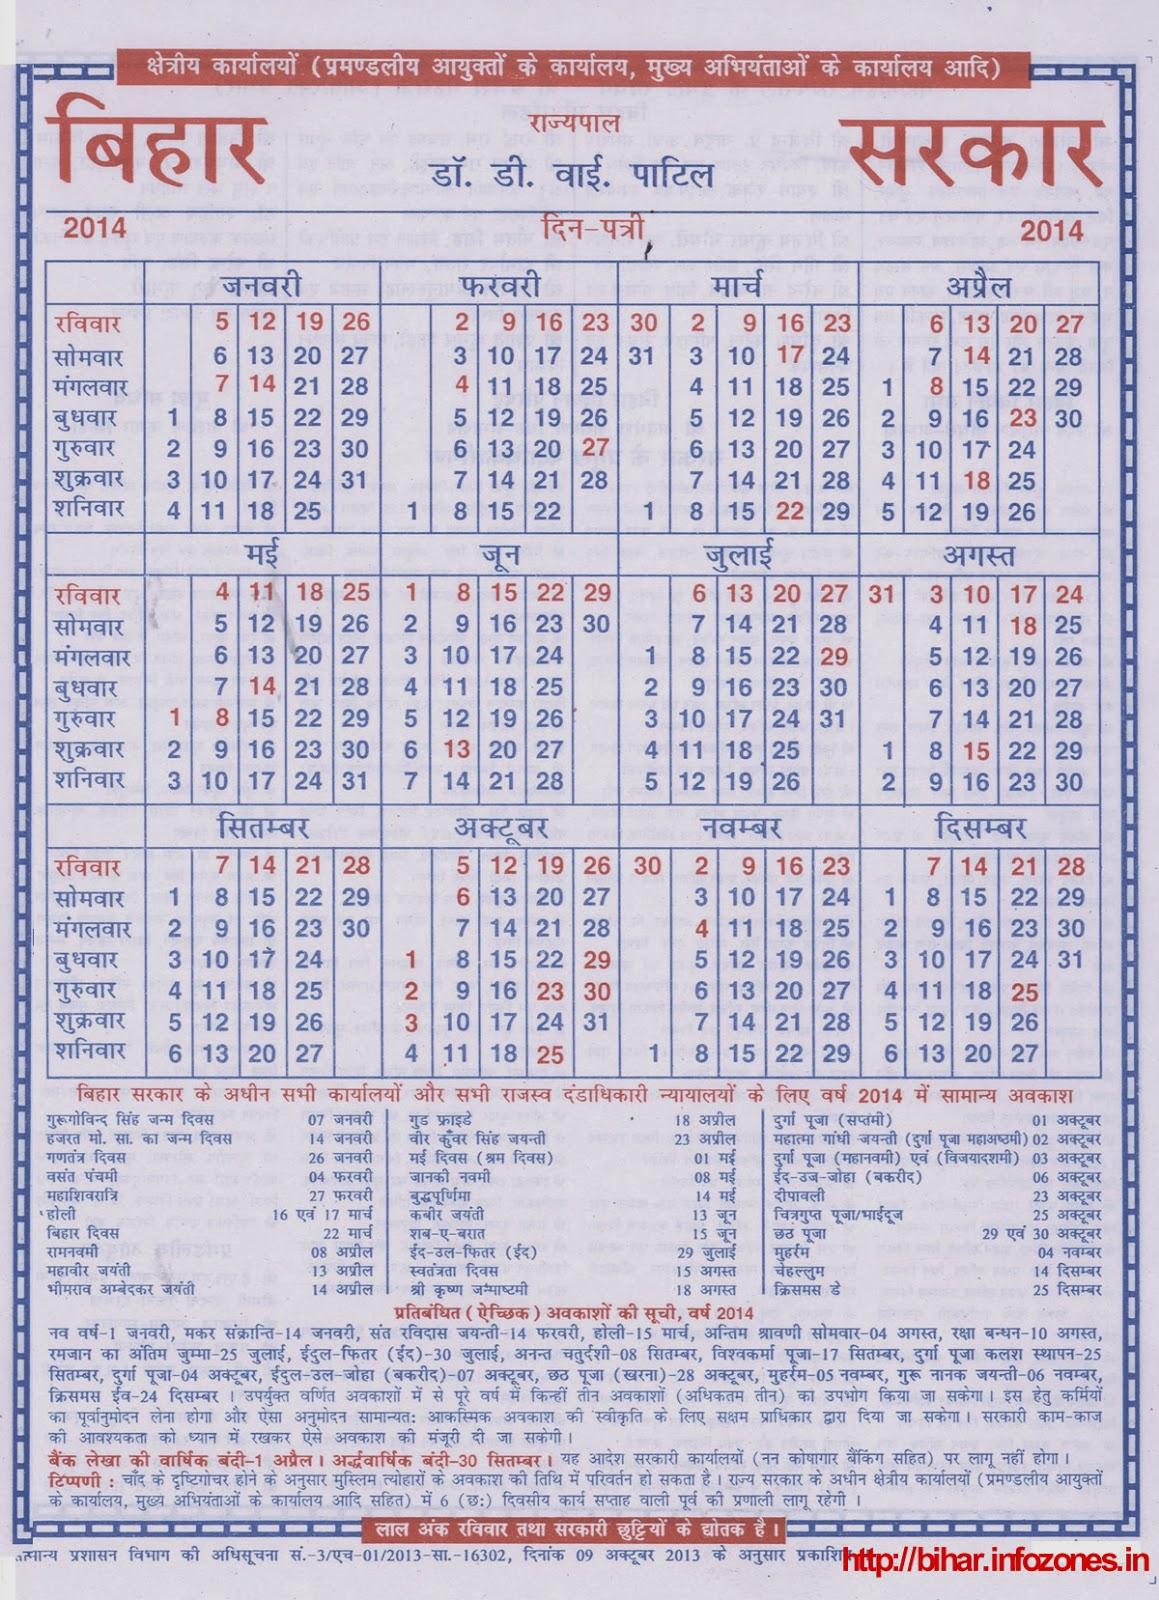 Bihar Government Calendar 2014 intended for Bihar Govt. Calendar